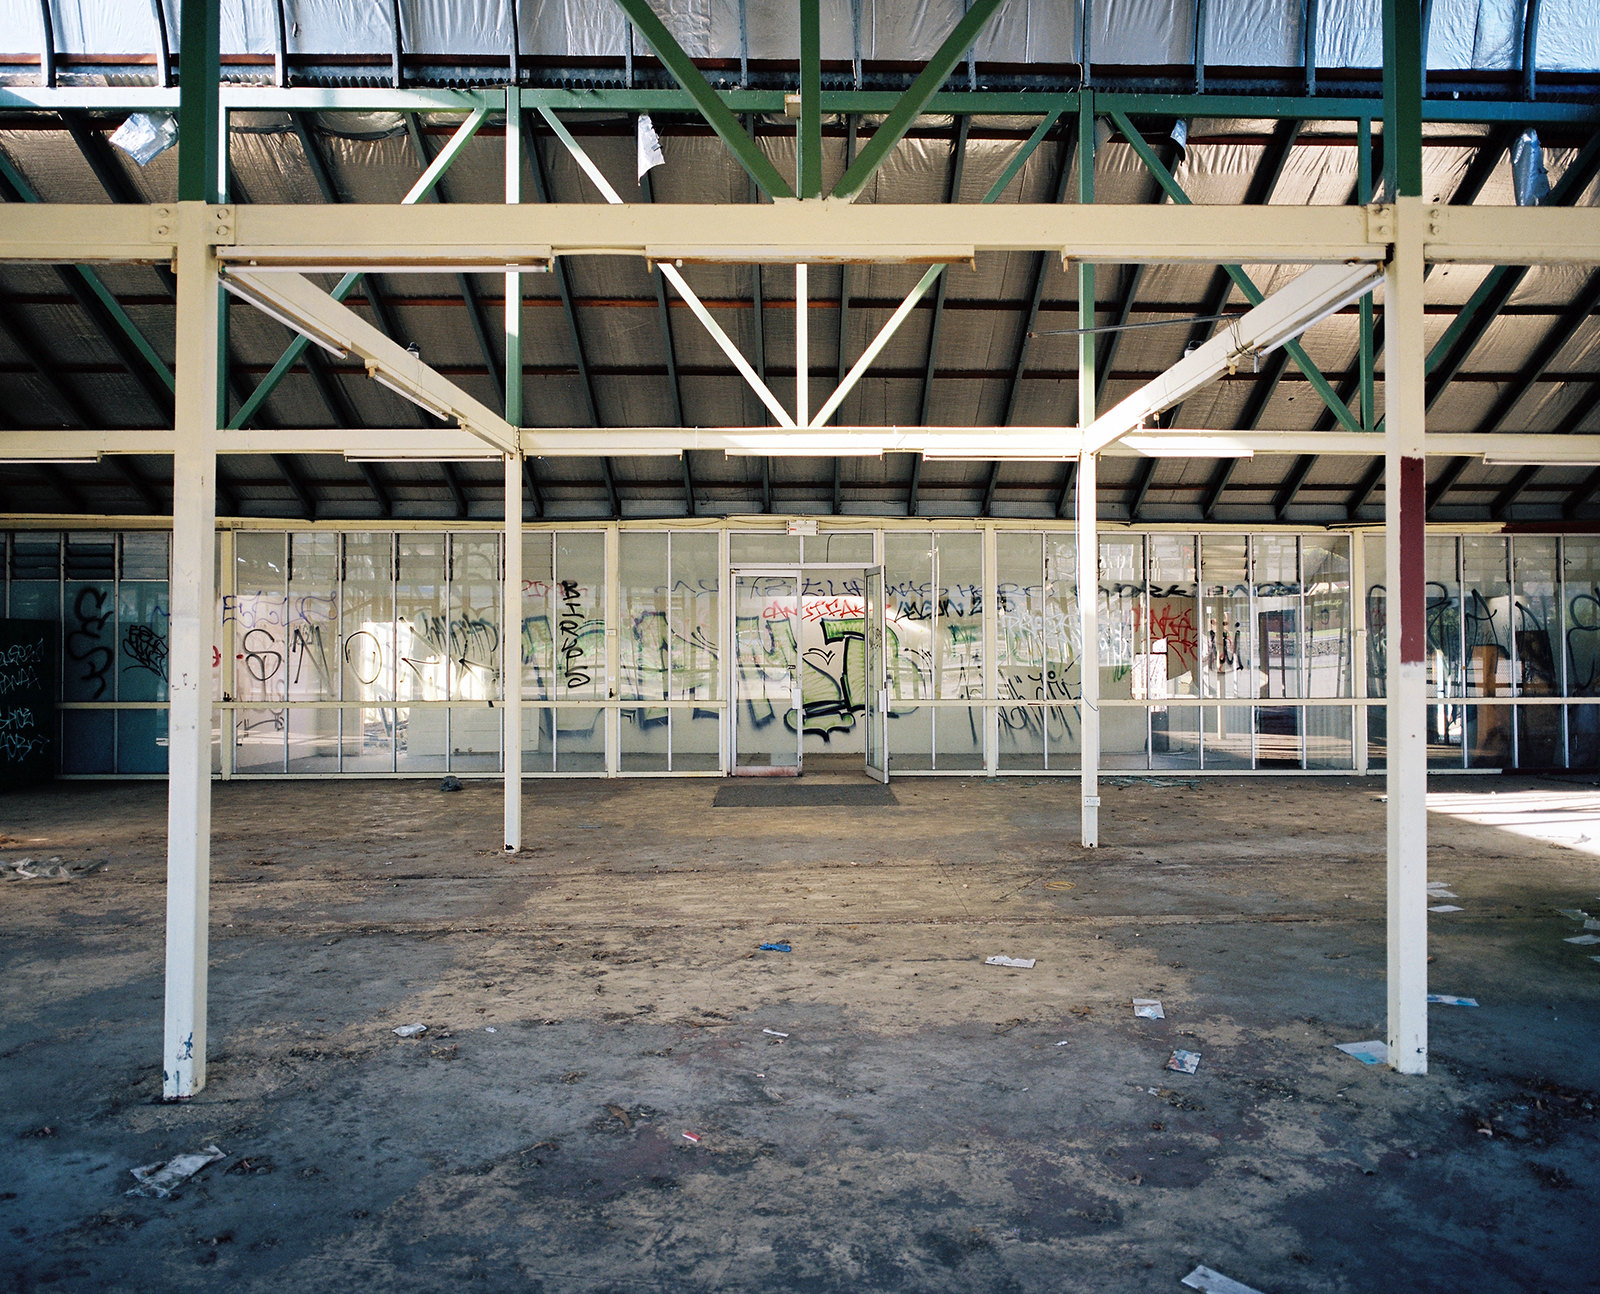 Abandoned Nursery #1